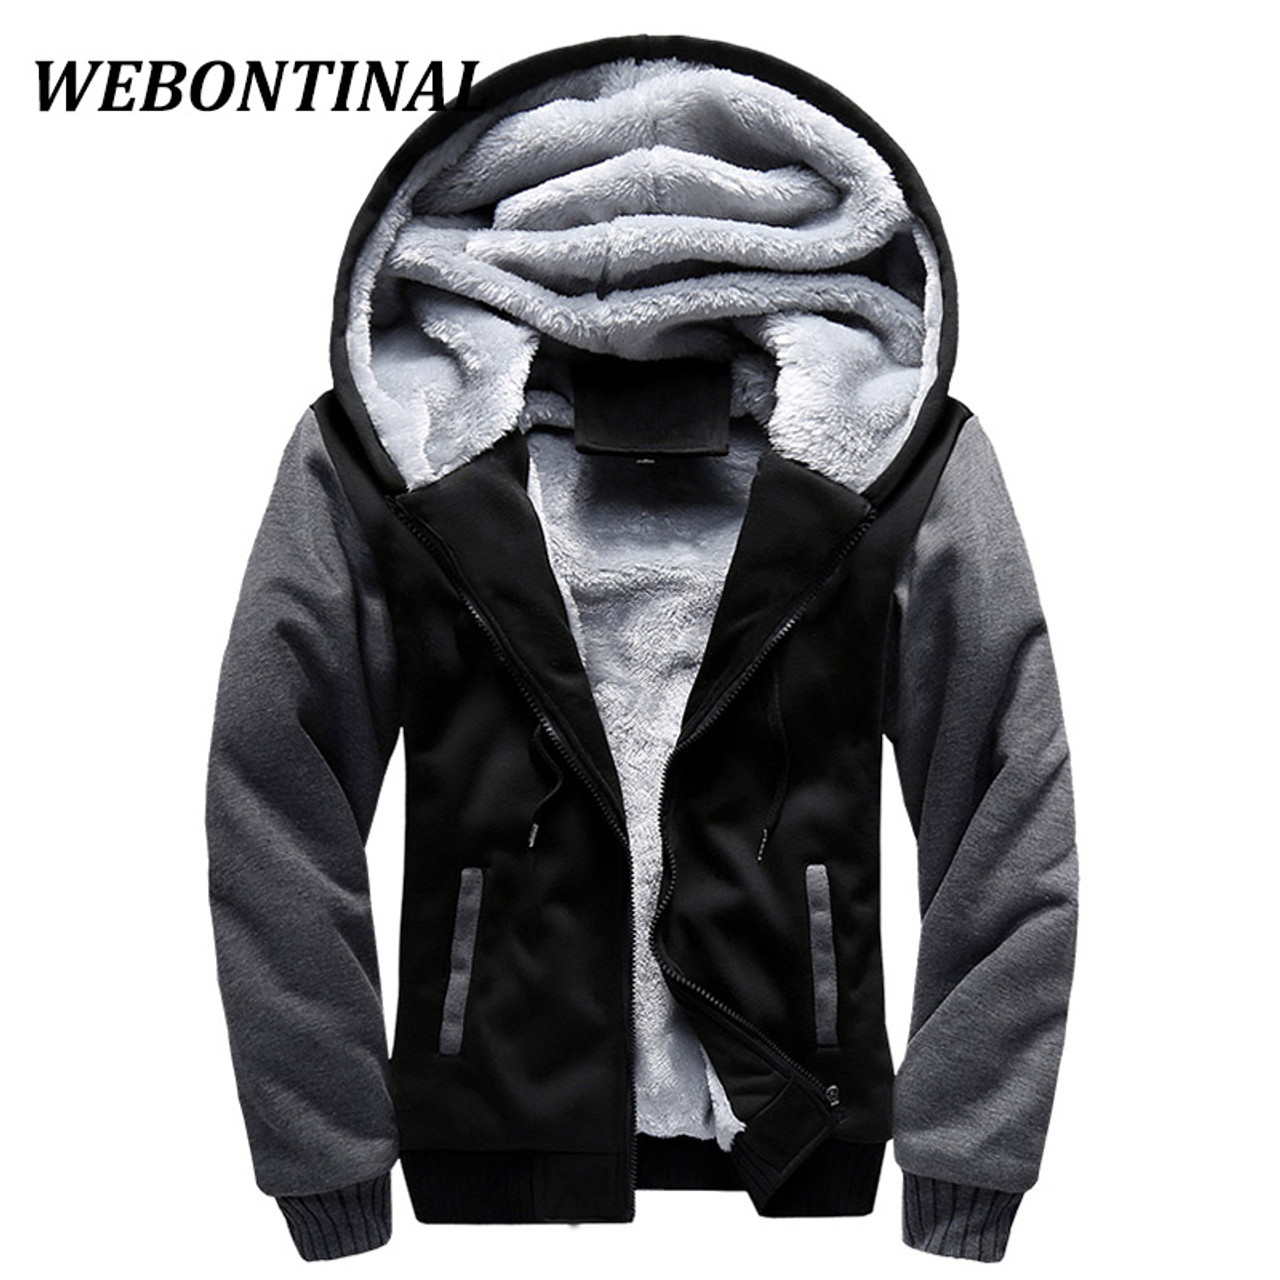 681ca55849f ... WEBONTINAL Hot Sale 2017 Winter Jacket Men Jackets Male Hooded Coats  Quality Zipper Casual Brand Thicken ...